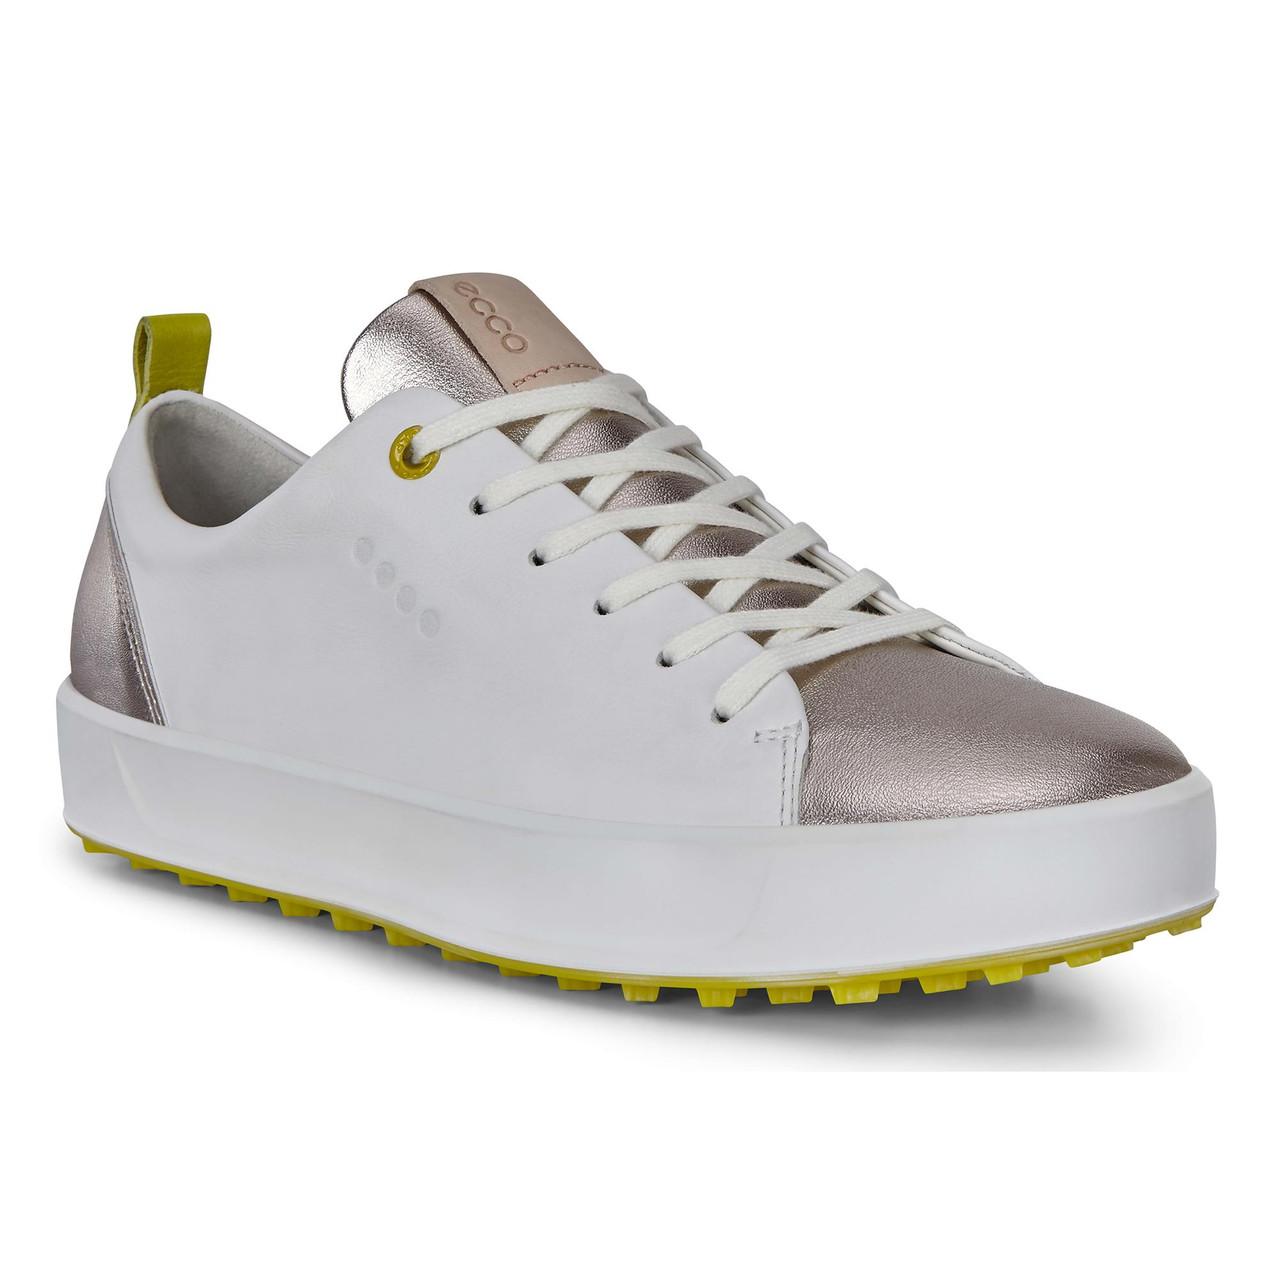 Ecco Women's Golf Soft Shoes White